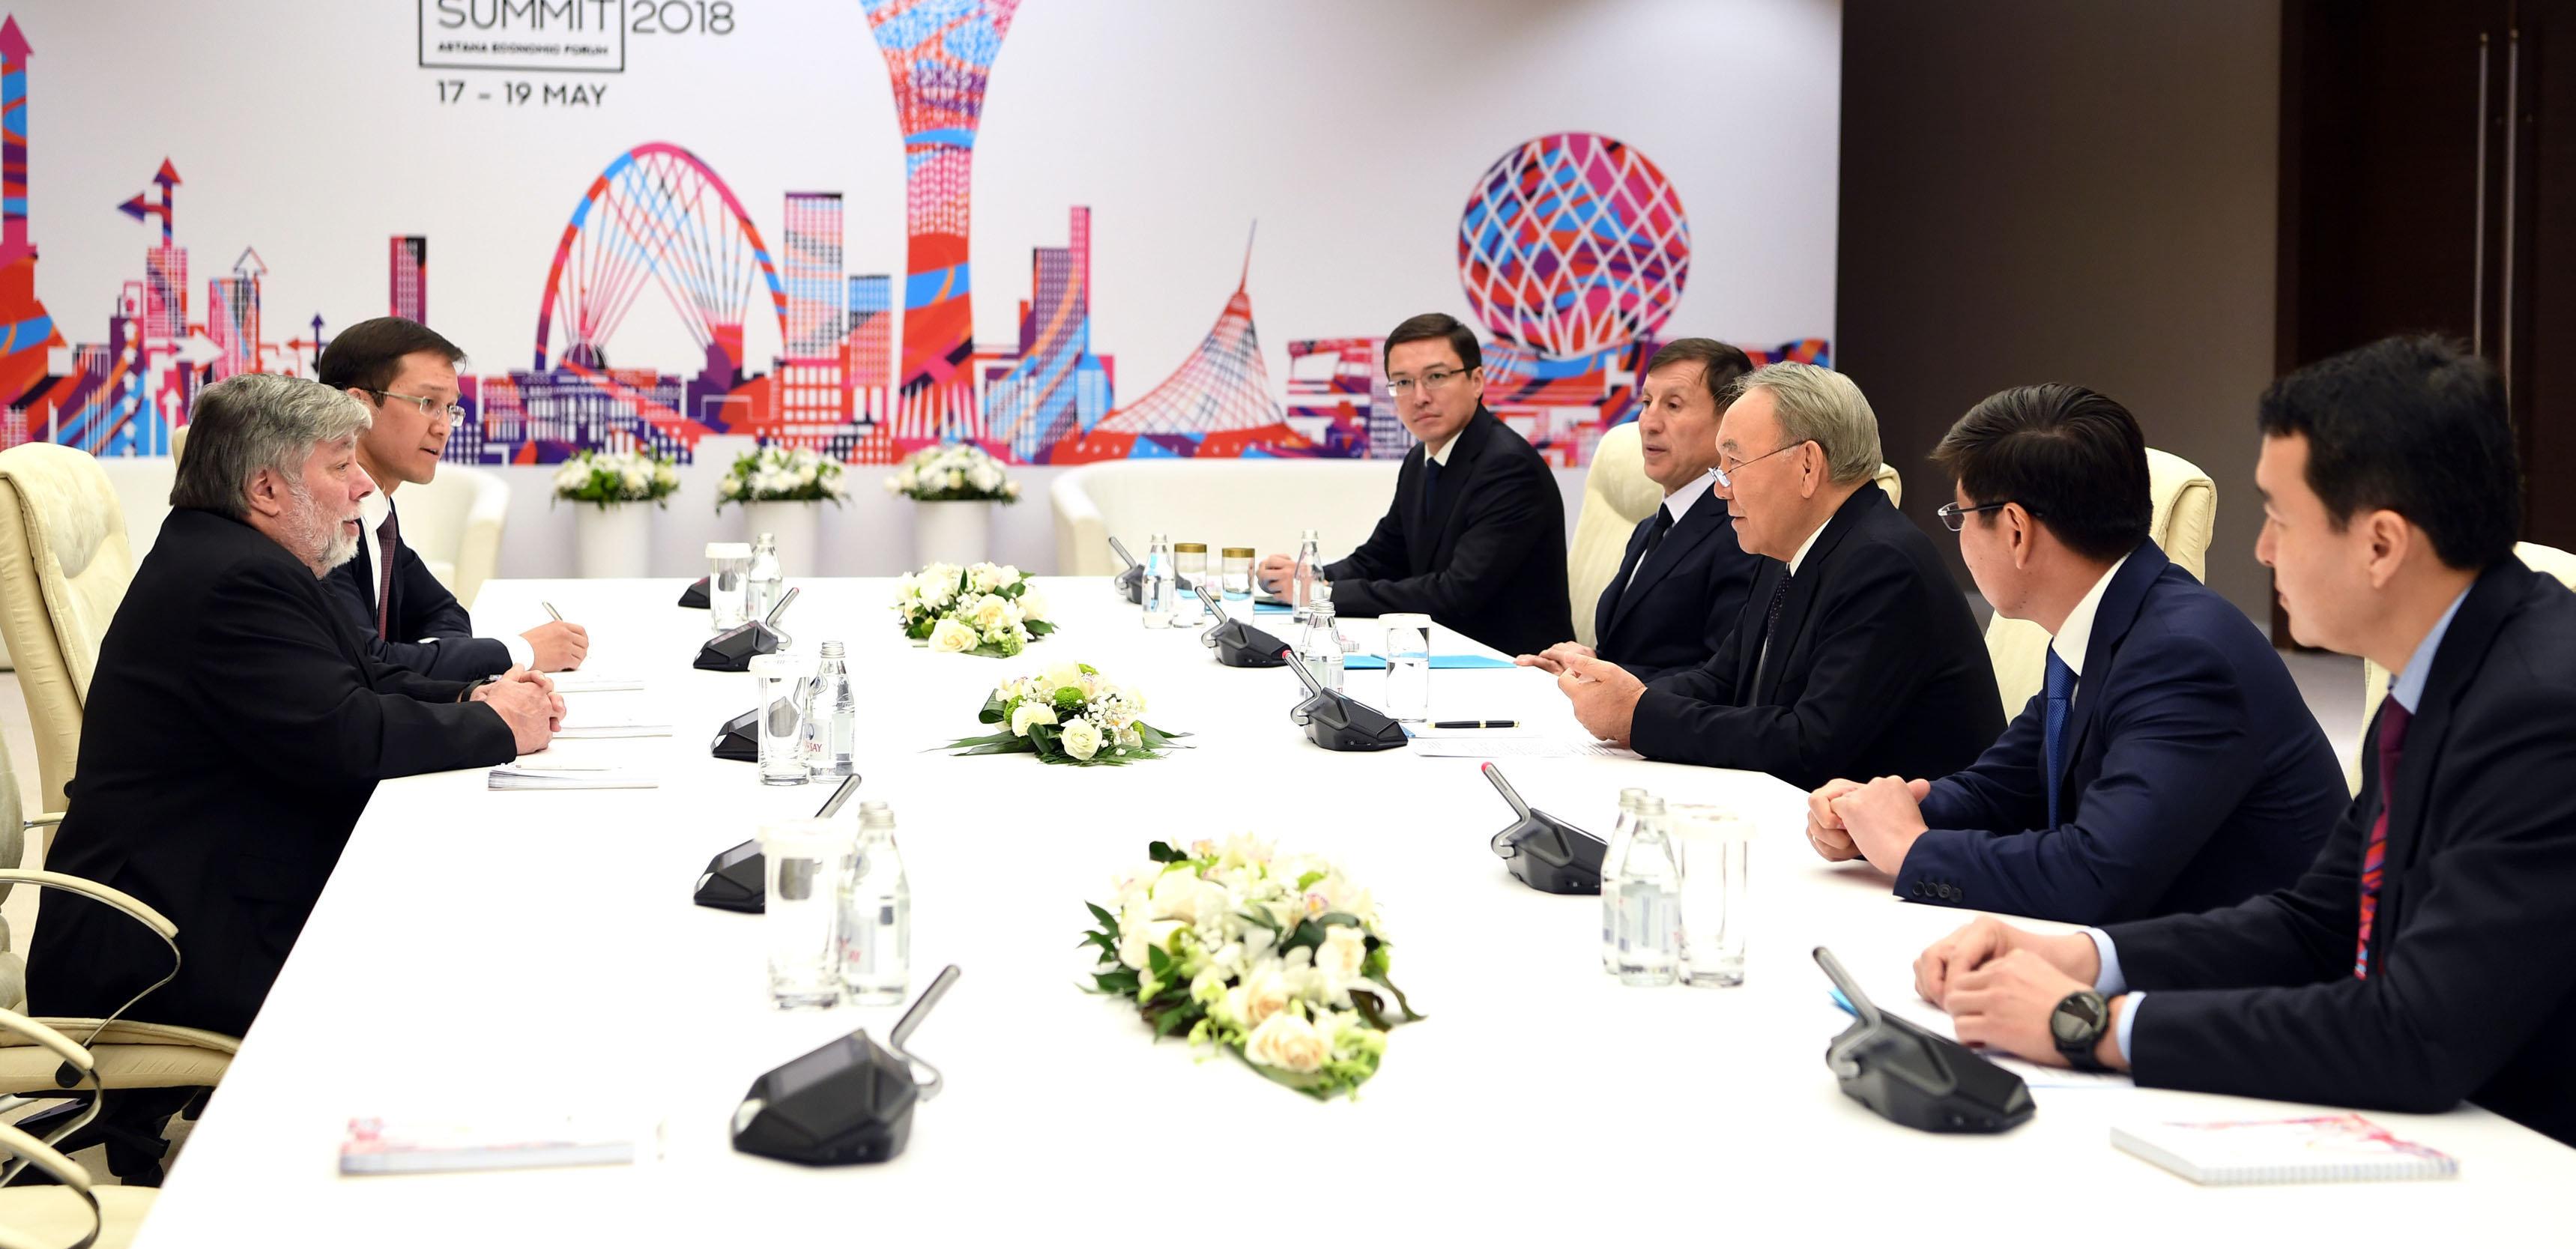 Нұрсұлтан Назарбаев пен Стив Возняк Астанада кездесті